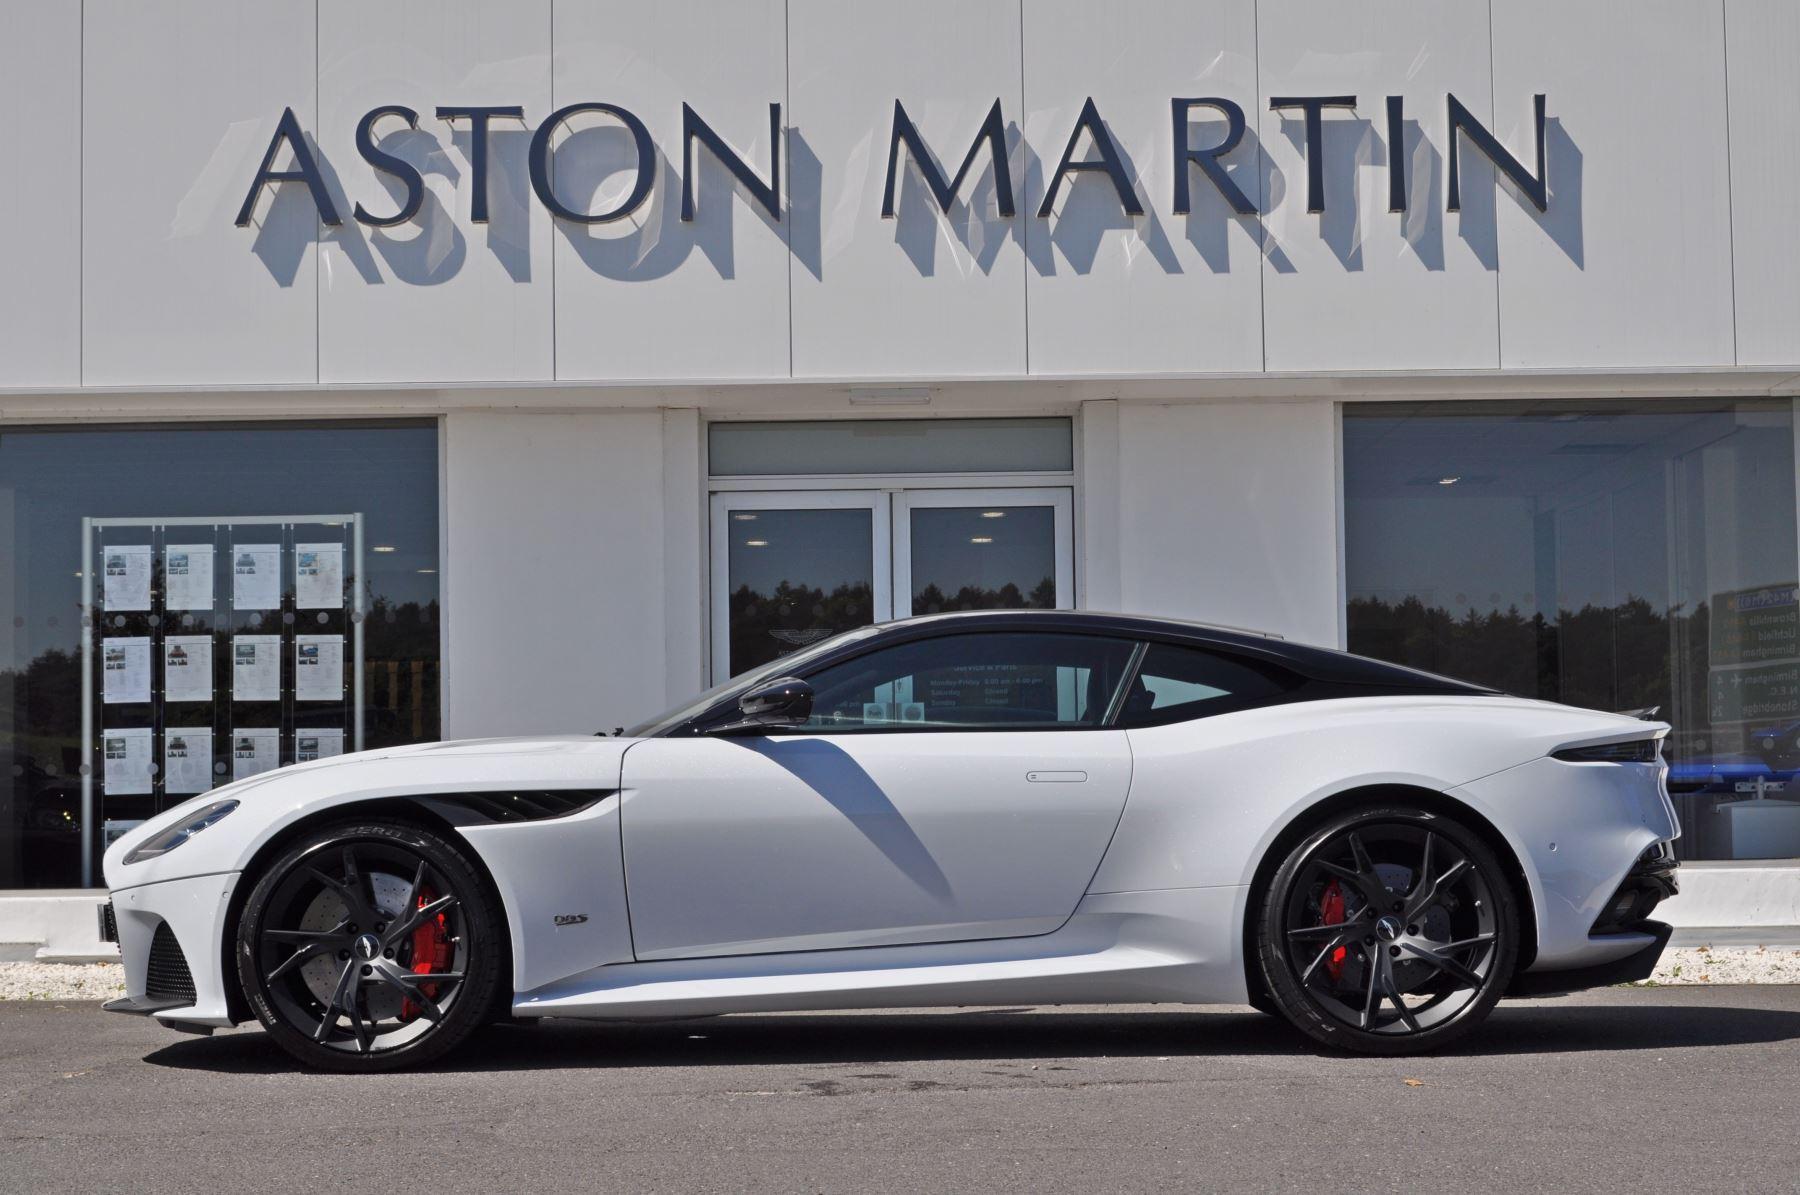 Aston Martin DBS V12 Superleggera 2dr Touchtronic image 8